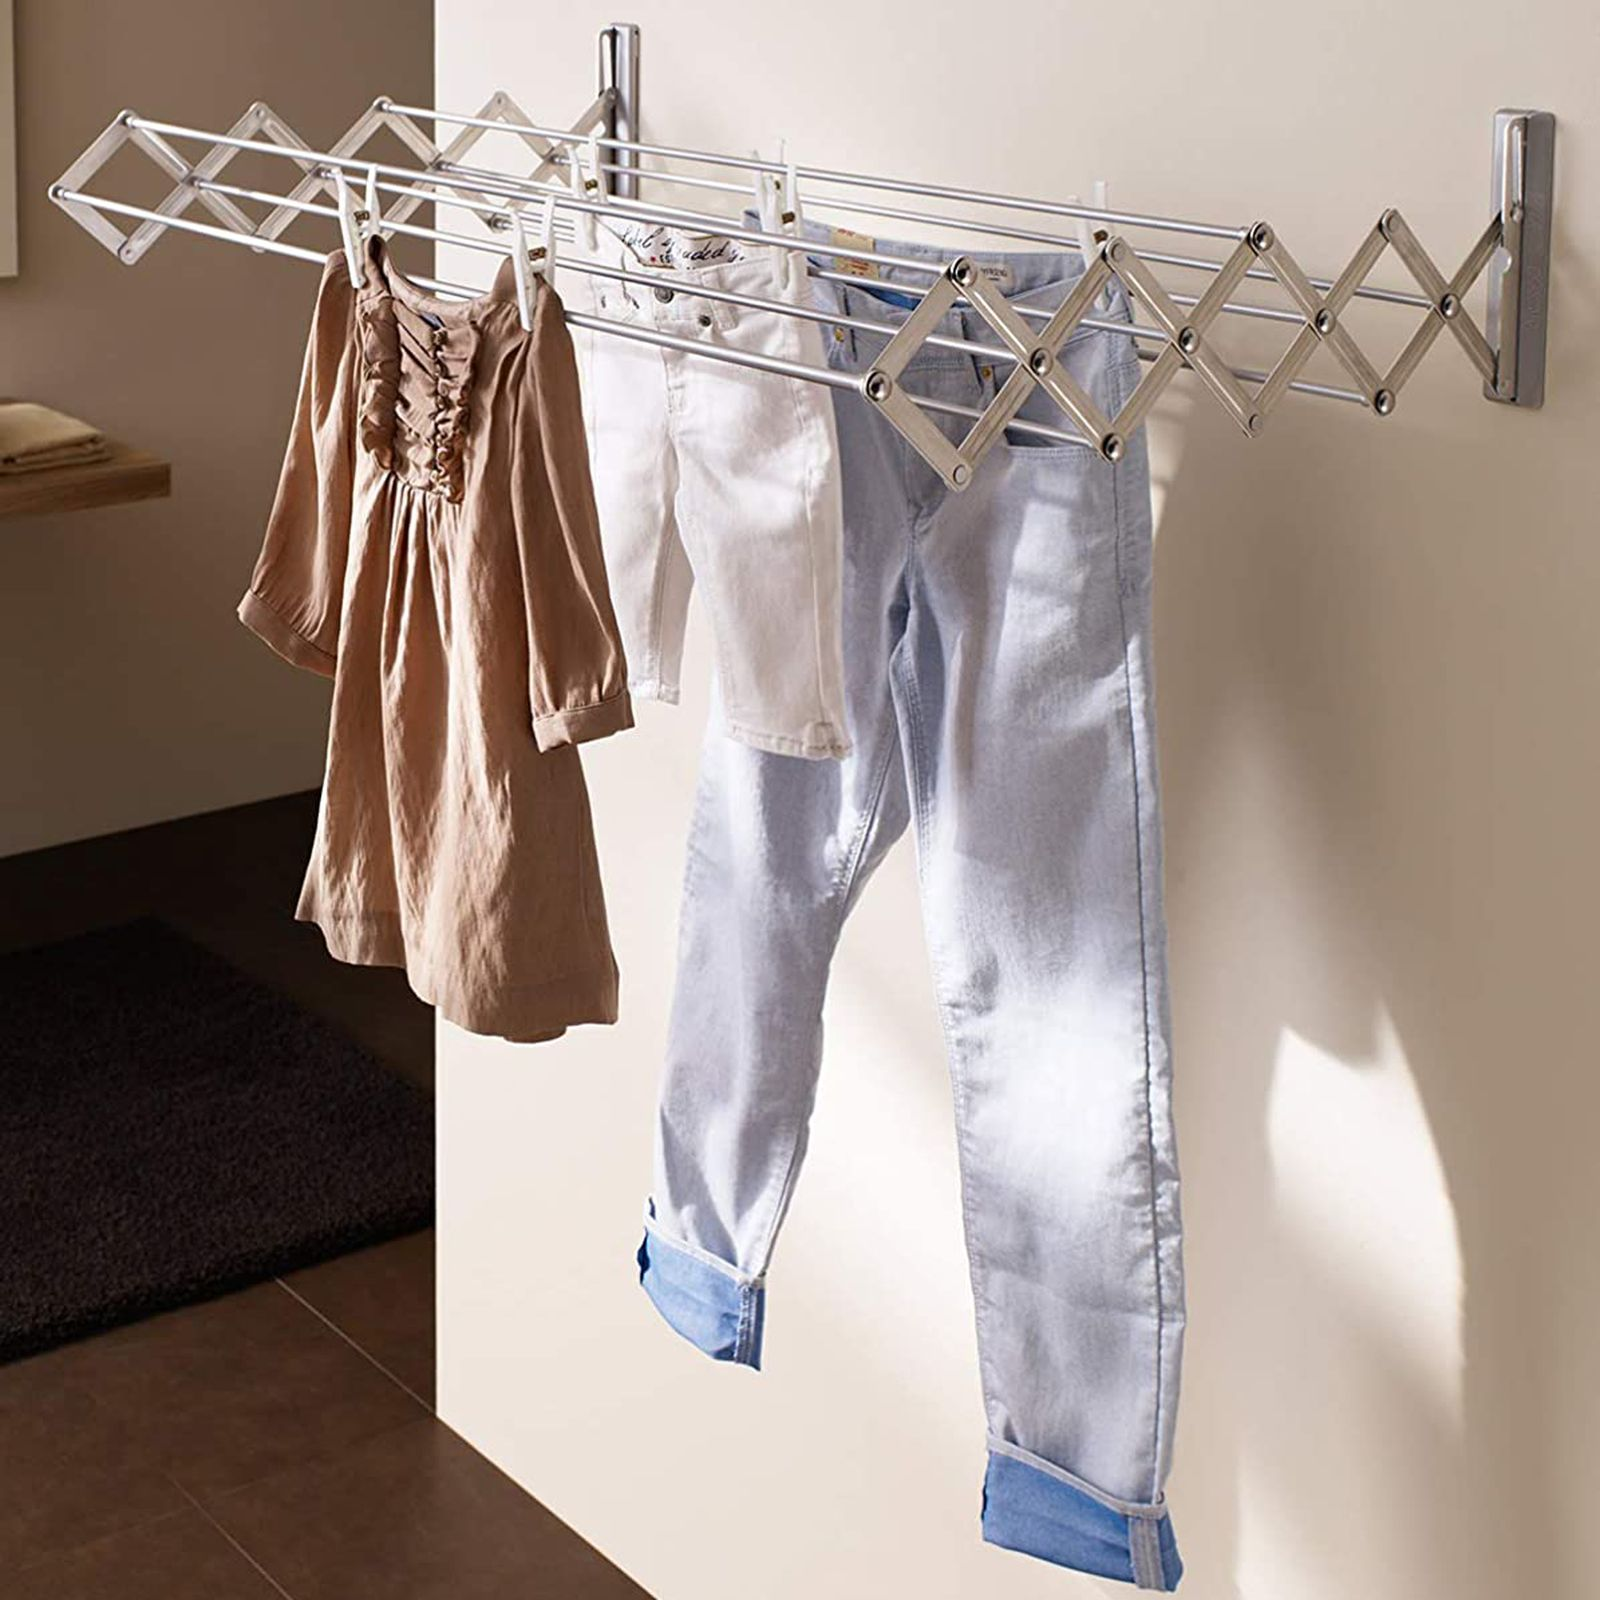 Suszarka na pranie ścienna Artweger by Juwel Ruckzuck 60 cm JUWEL